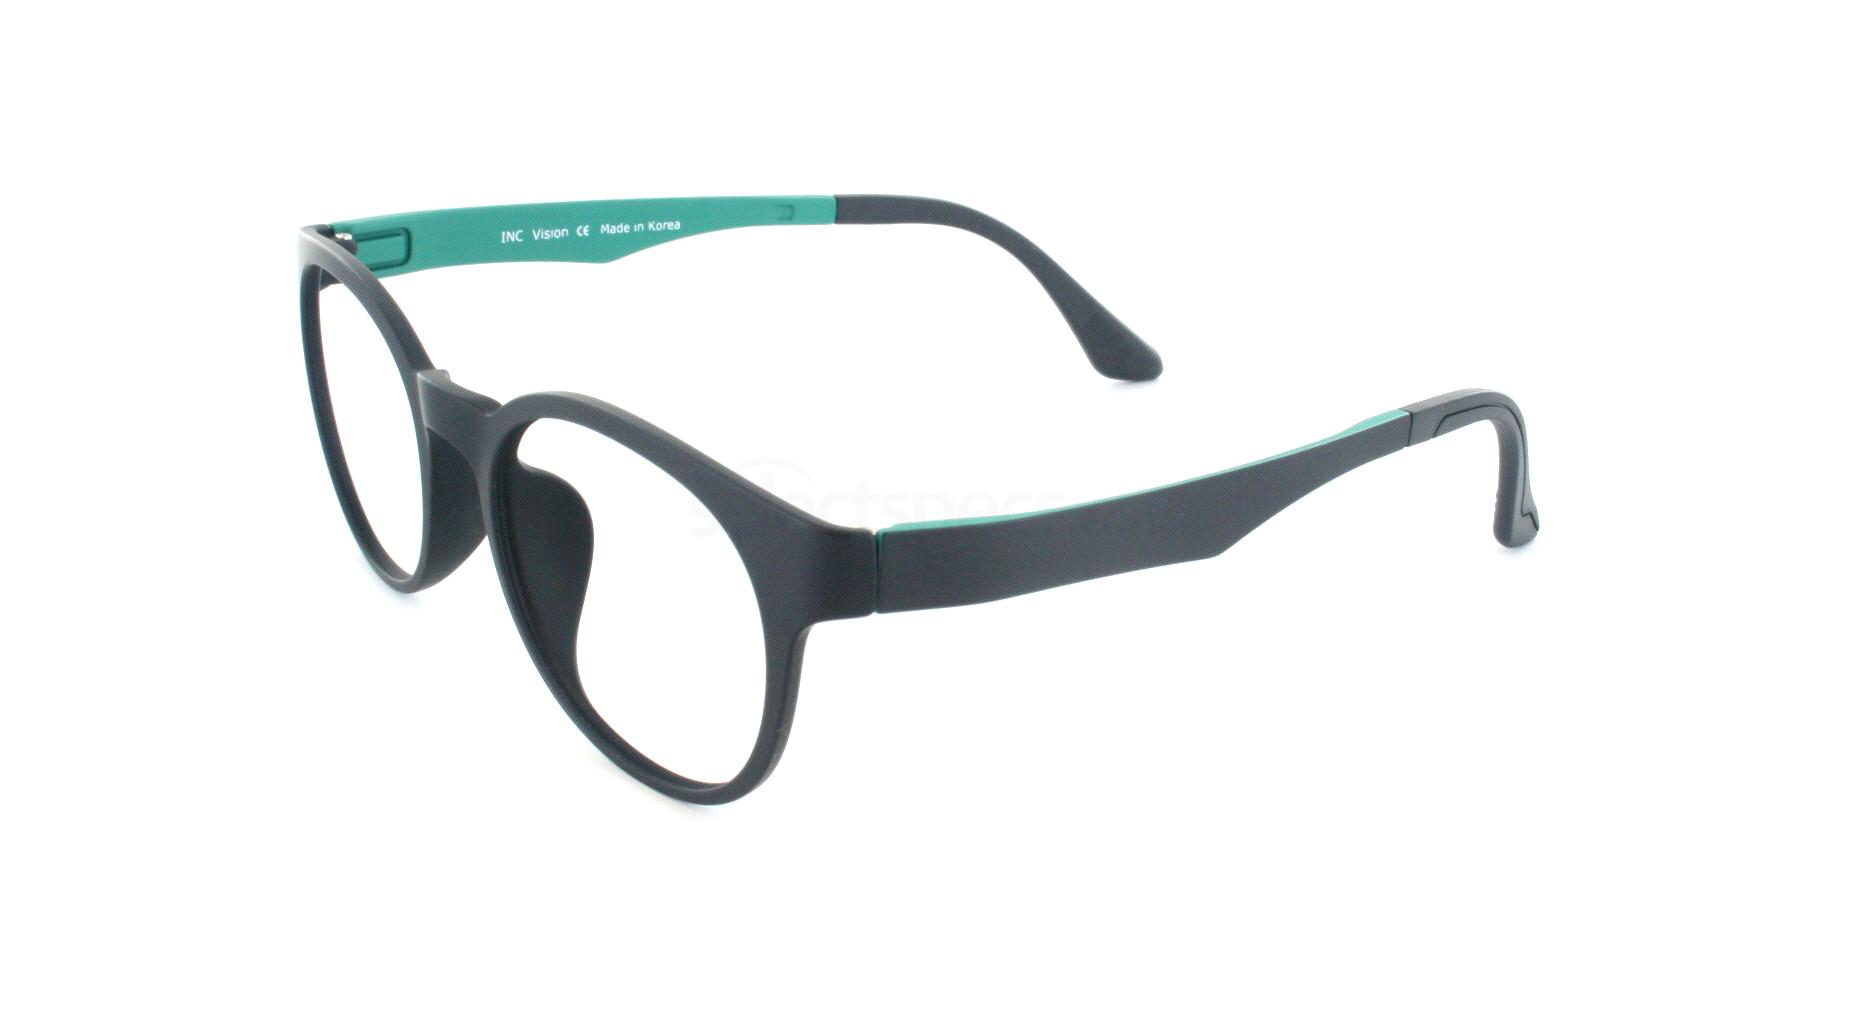 20BK INC 998 Glasses, INC Vision